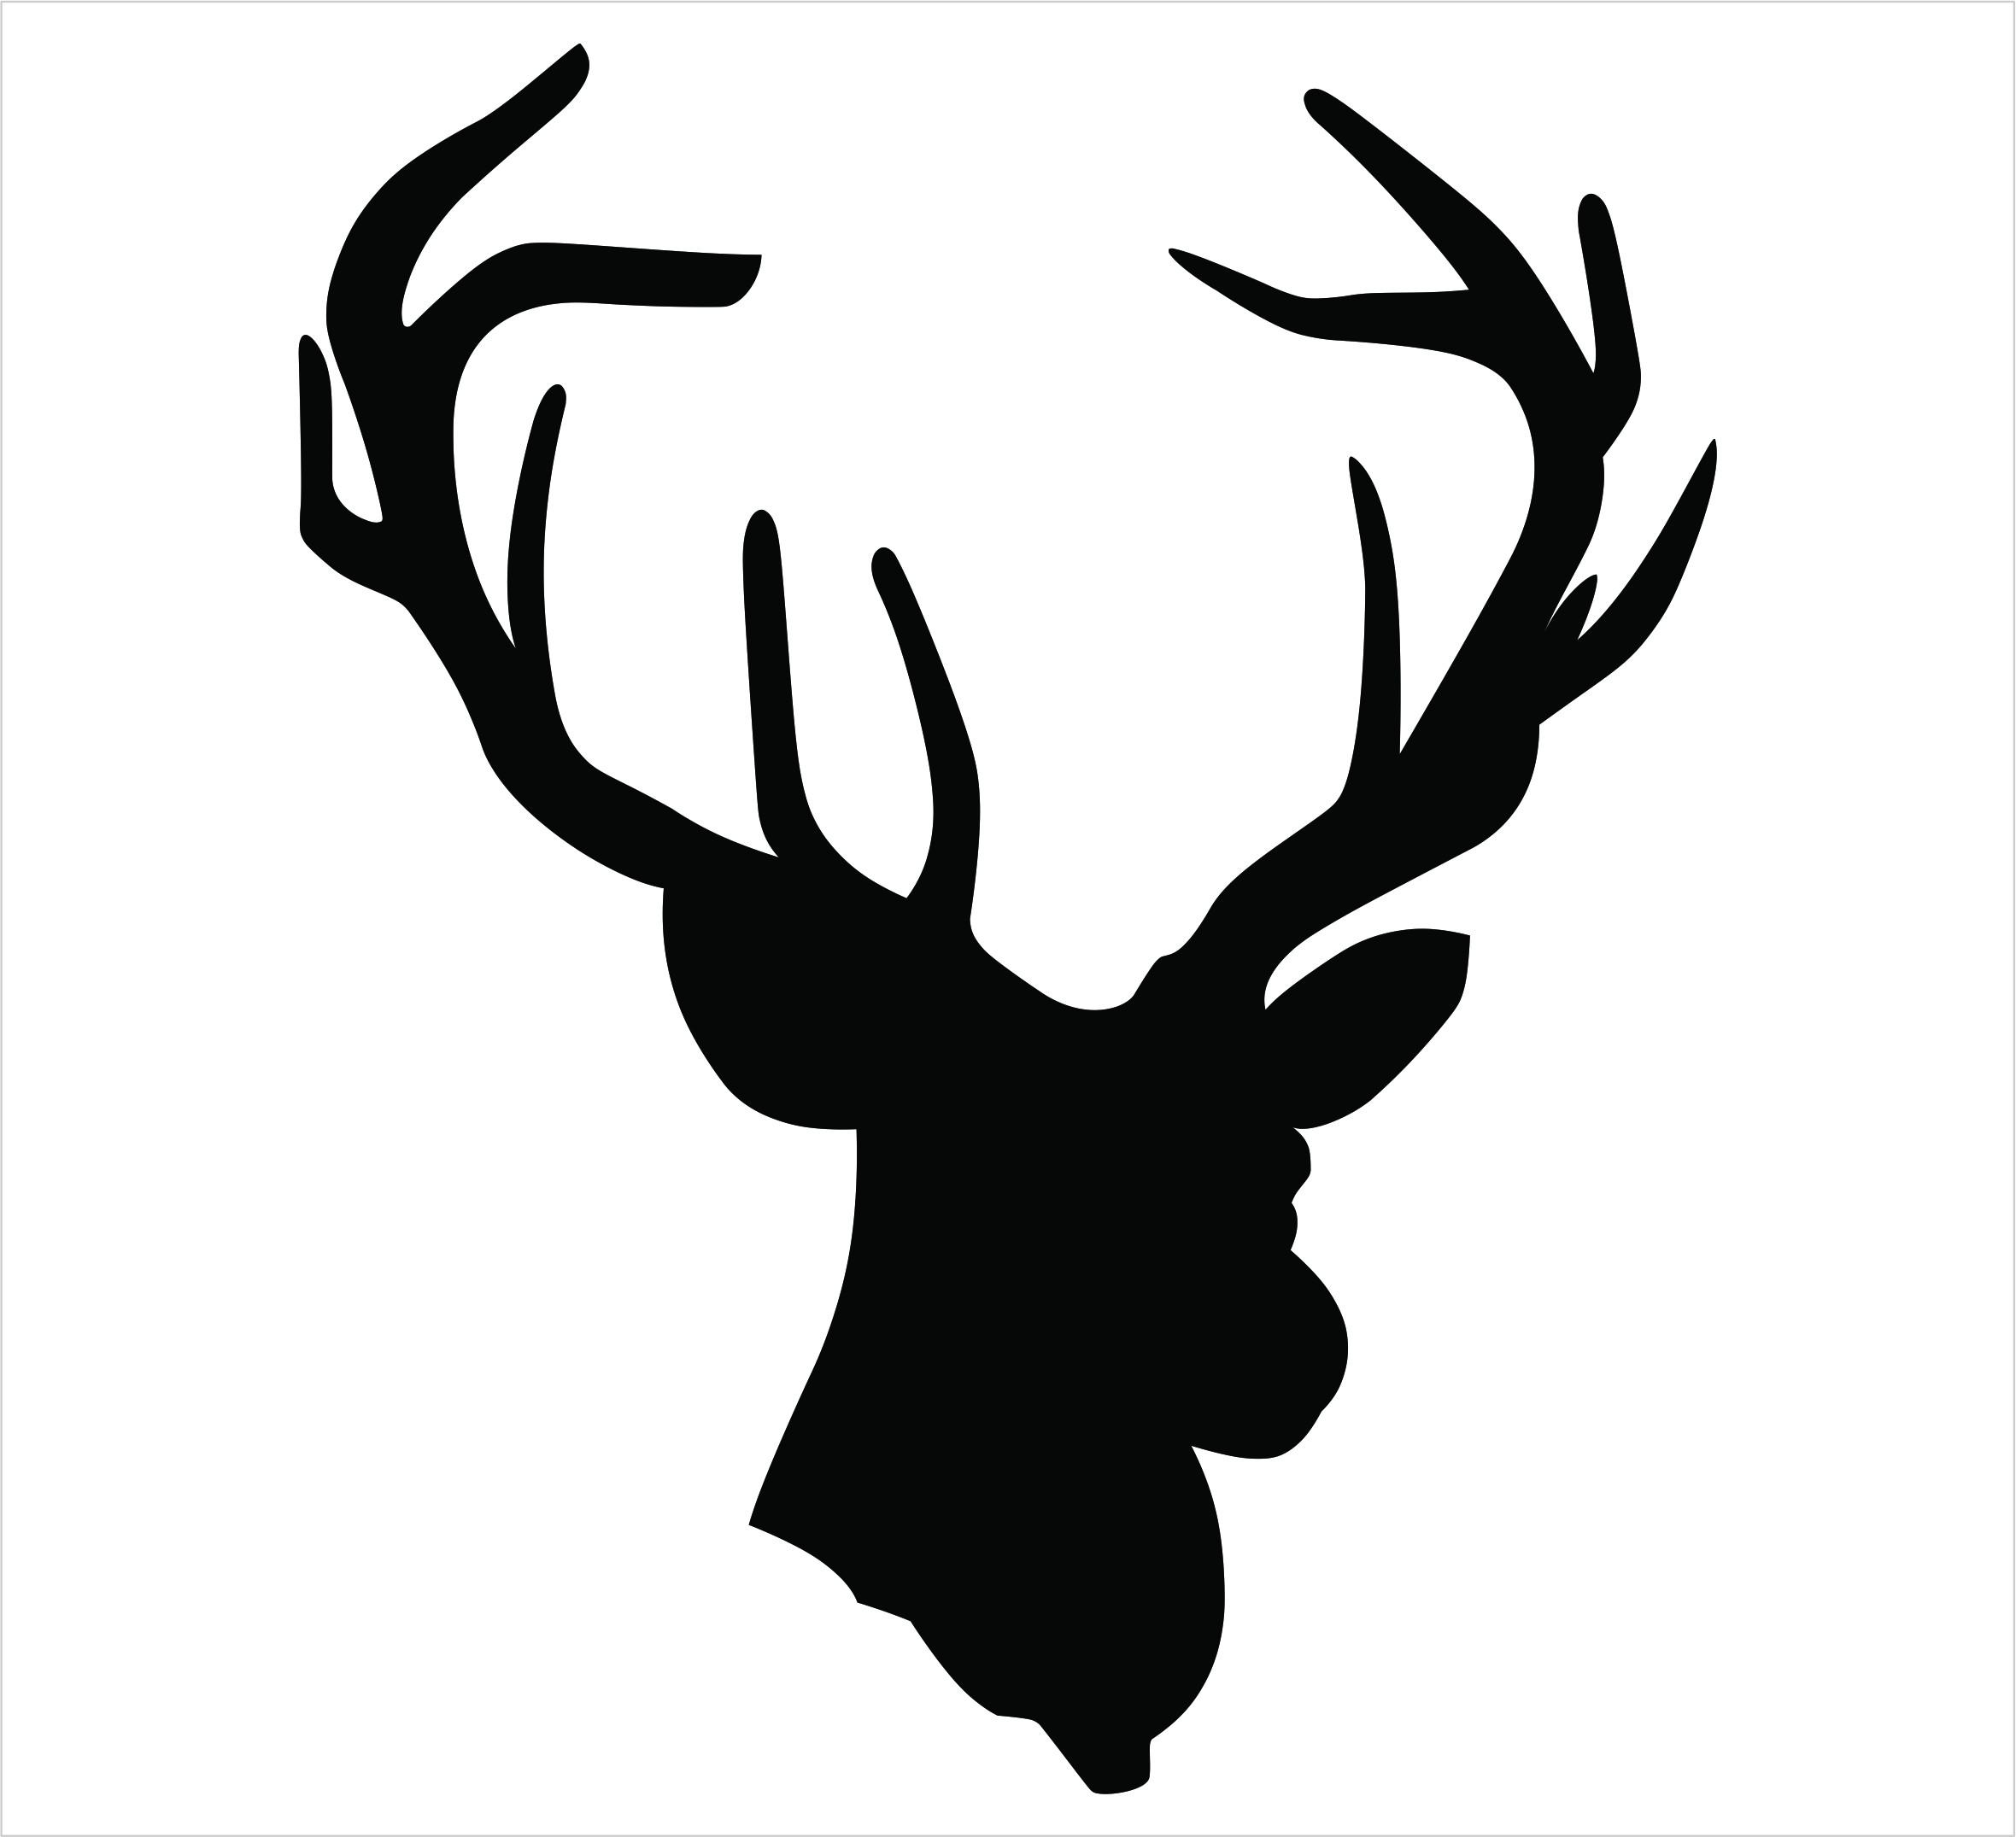 2360x2151 Black Silhouette Of Deer Antlers Stock Vector Art 827623316 Istock